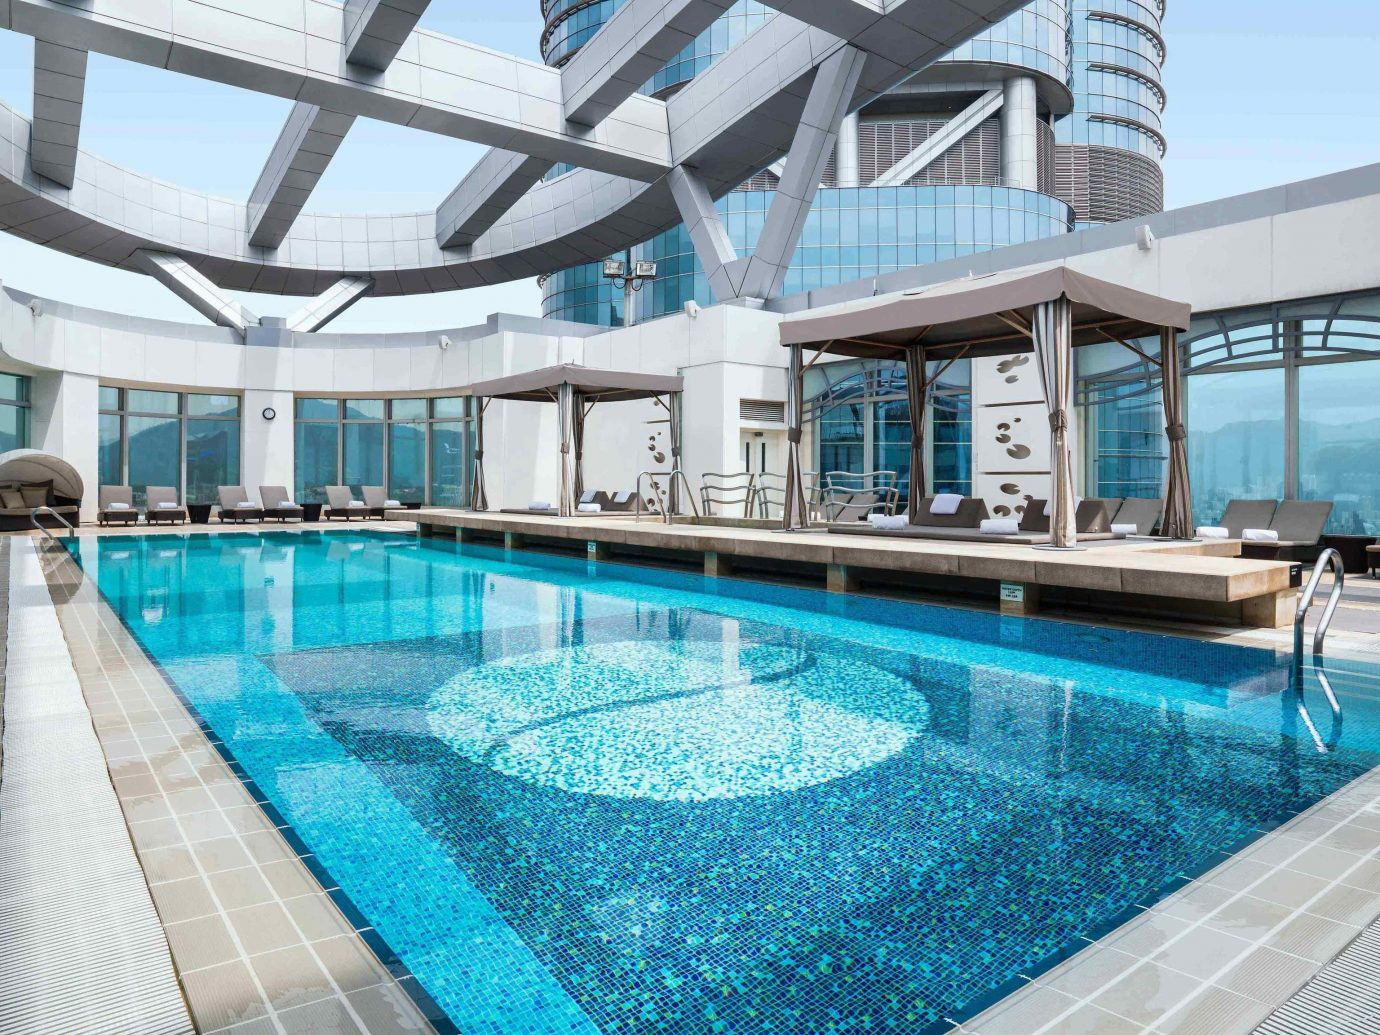 Trip Ideas building swimming pool property Pool leisure condominium Resort leisure centre estate blue real estate Villa swimming